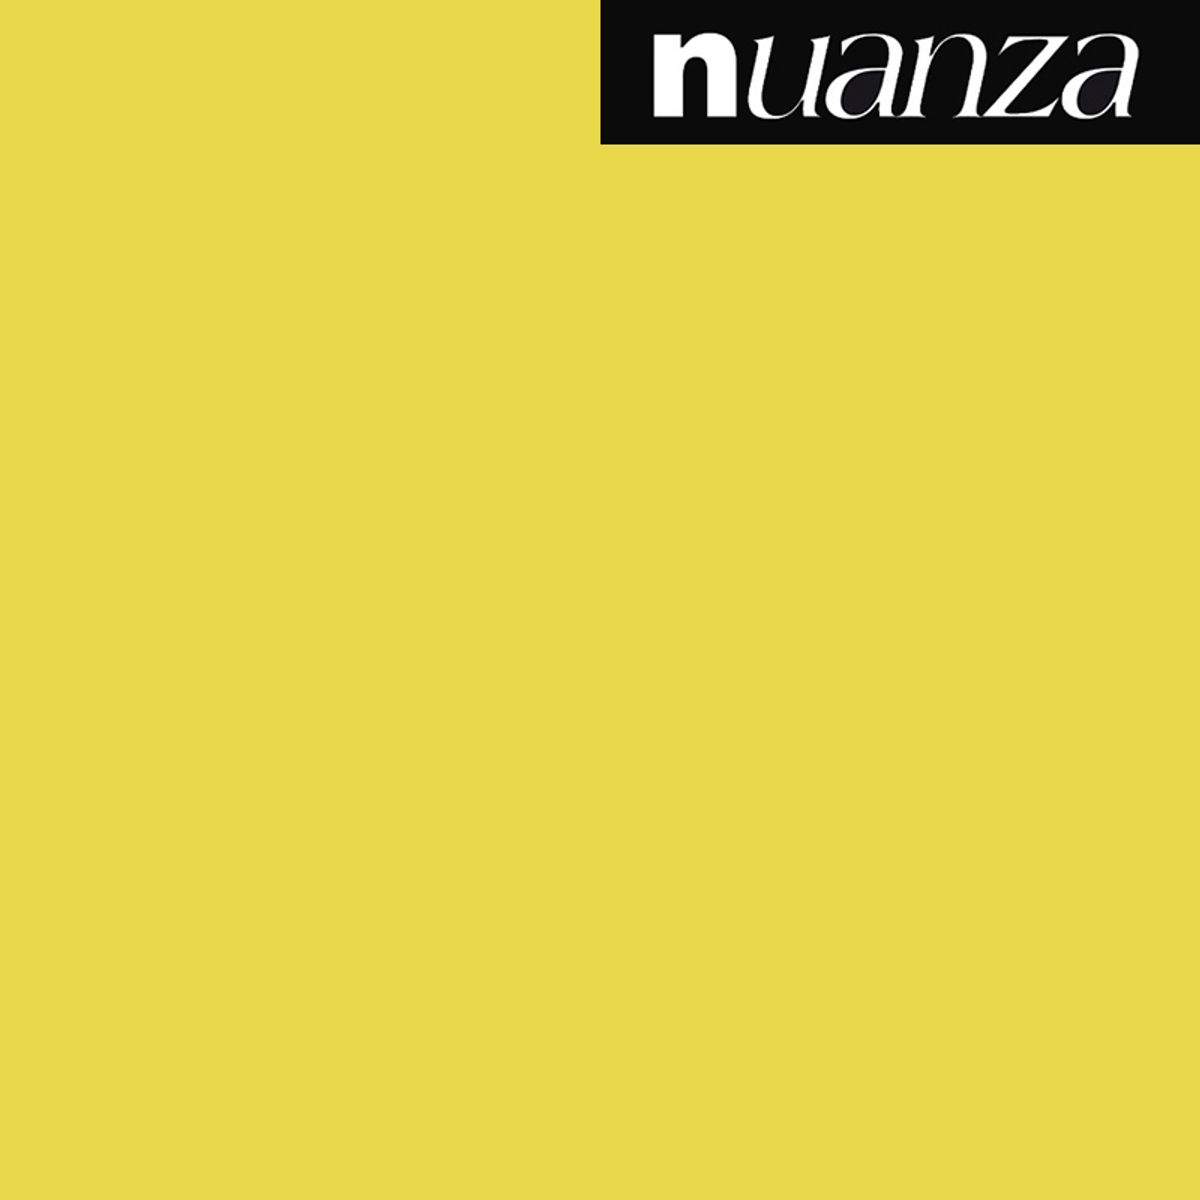 Peinture jaune moutarde satin monocouche Nuanza